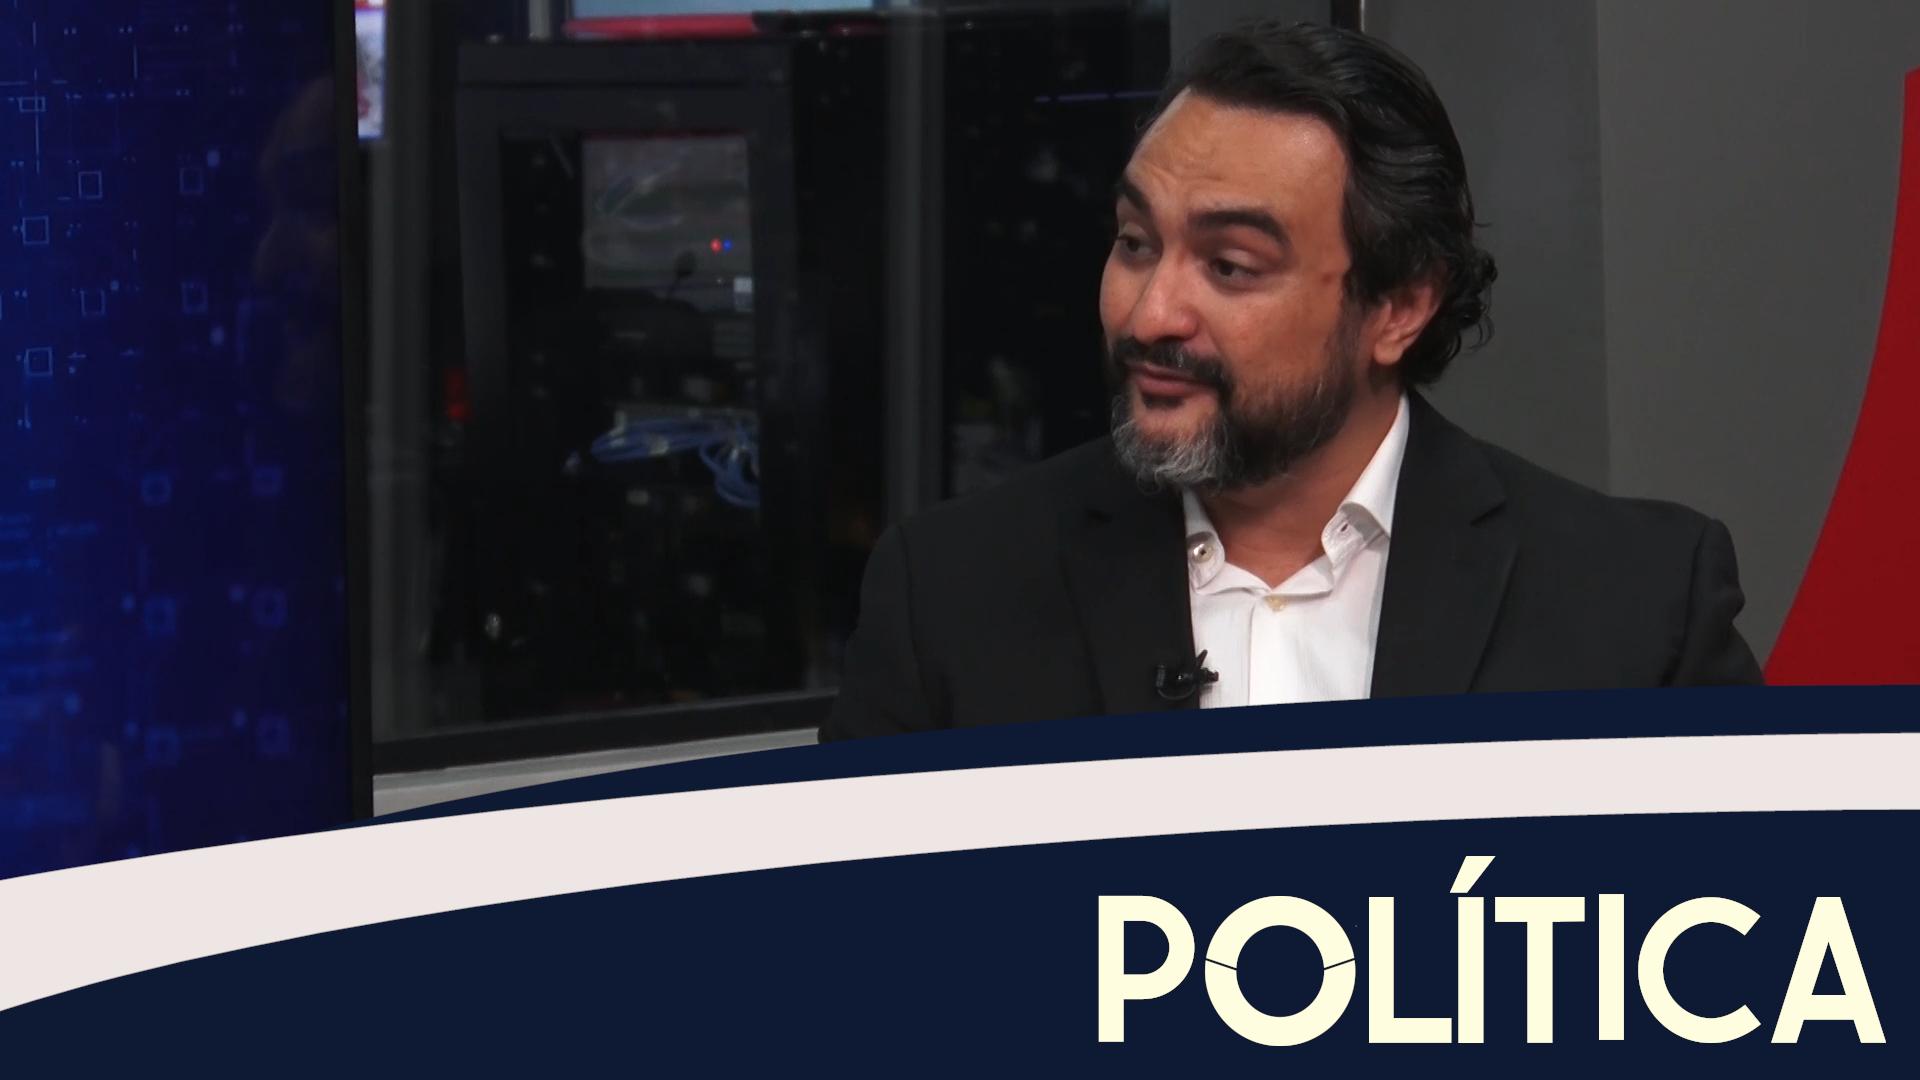 Política entrevista, Leonardo Bayma, consultor político